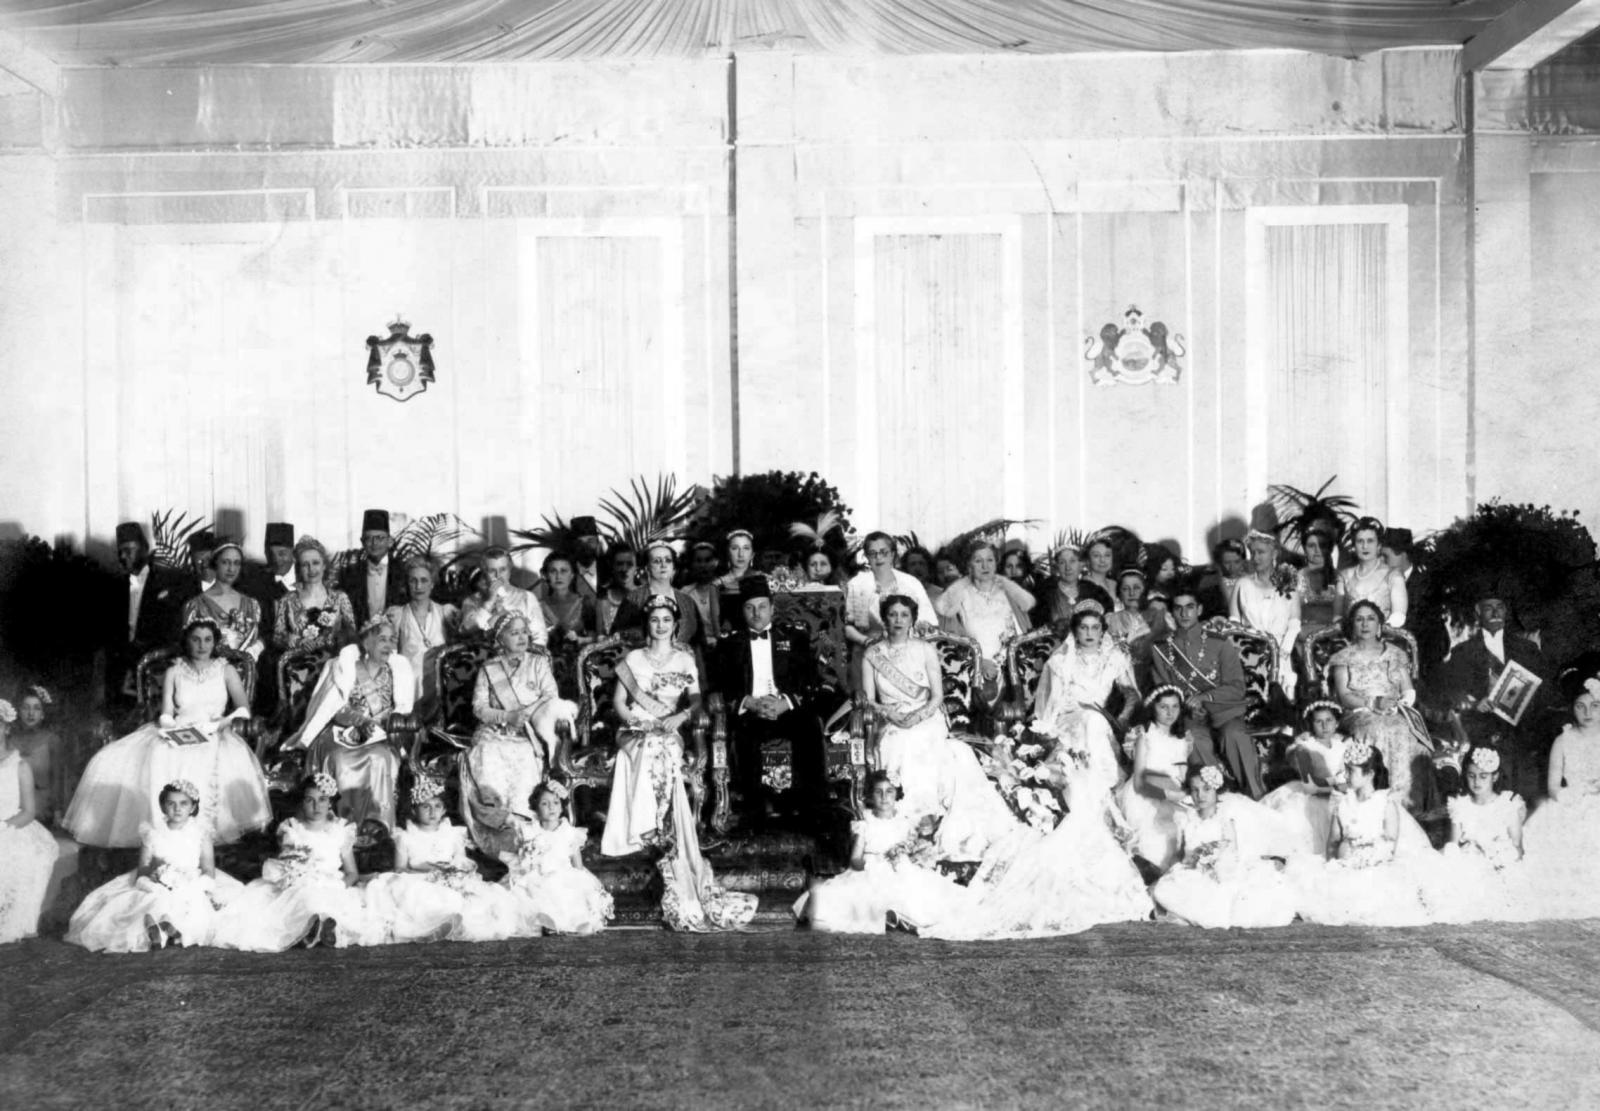 large.1916026856_ModernEgypt_Wedding_of_Mohammad_Reza_Pahlavi__Fawzia_DHP13655-20-5_01.jpg.c9cc19ba472ee7071b2b710a9bfa8d25.jpg